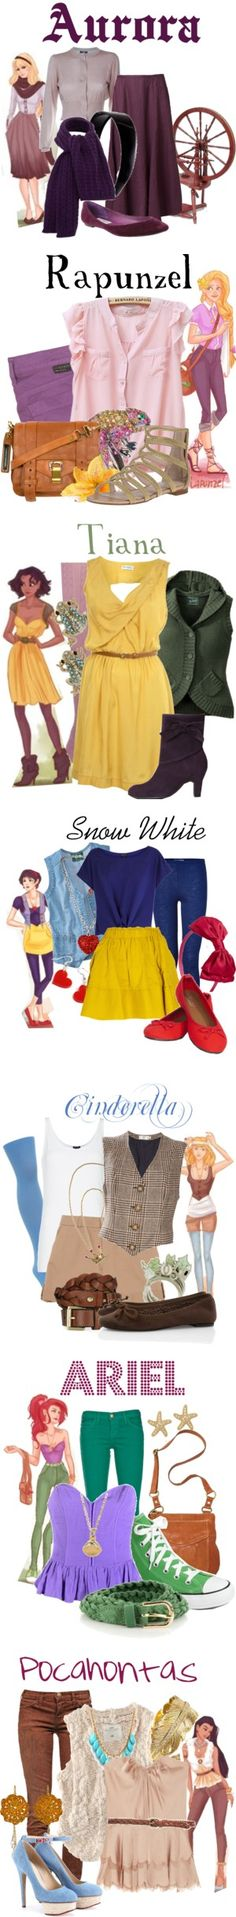 """Hipster Disney Princess Collection"""